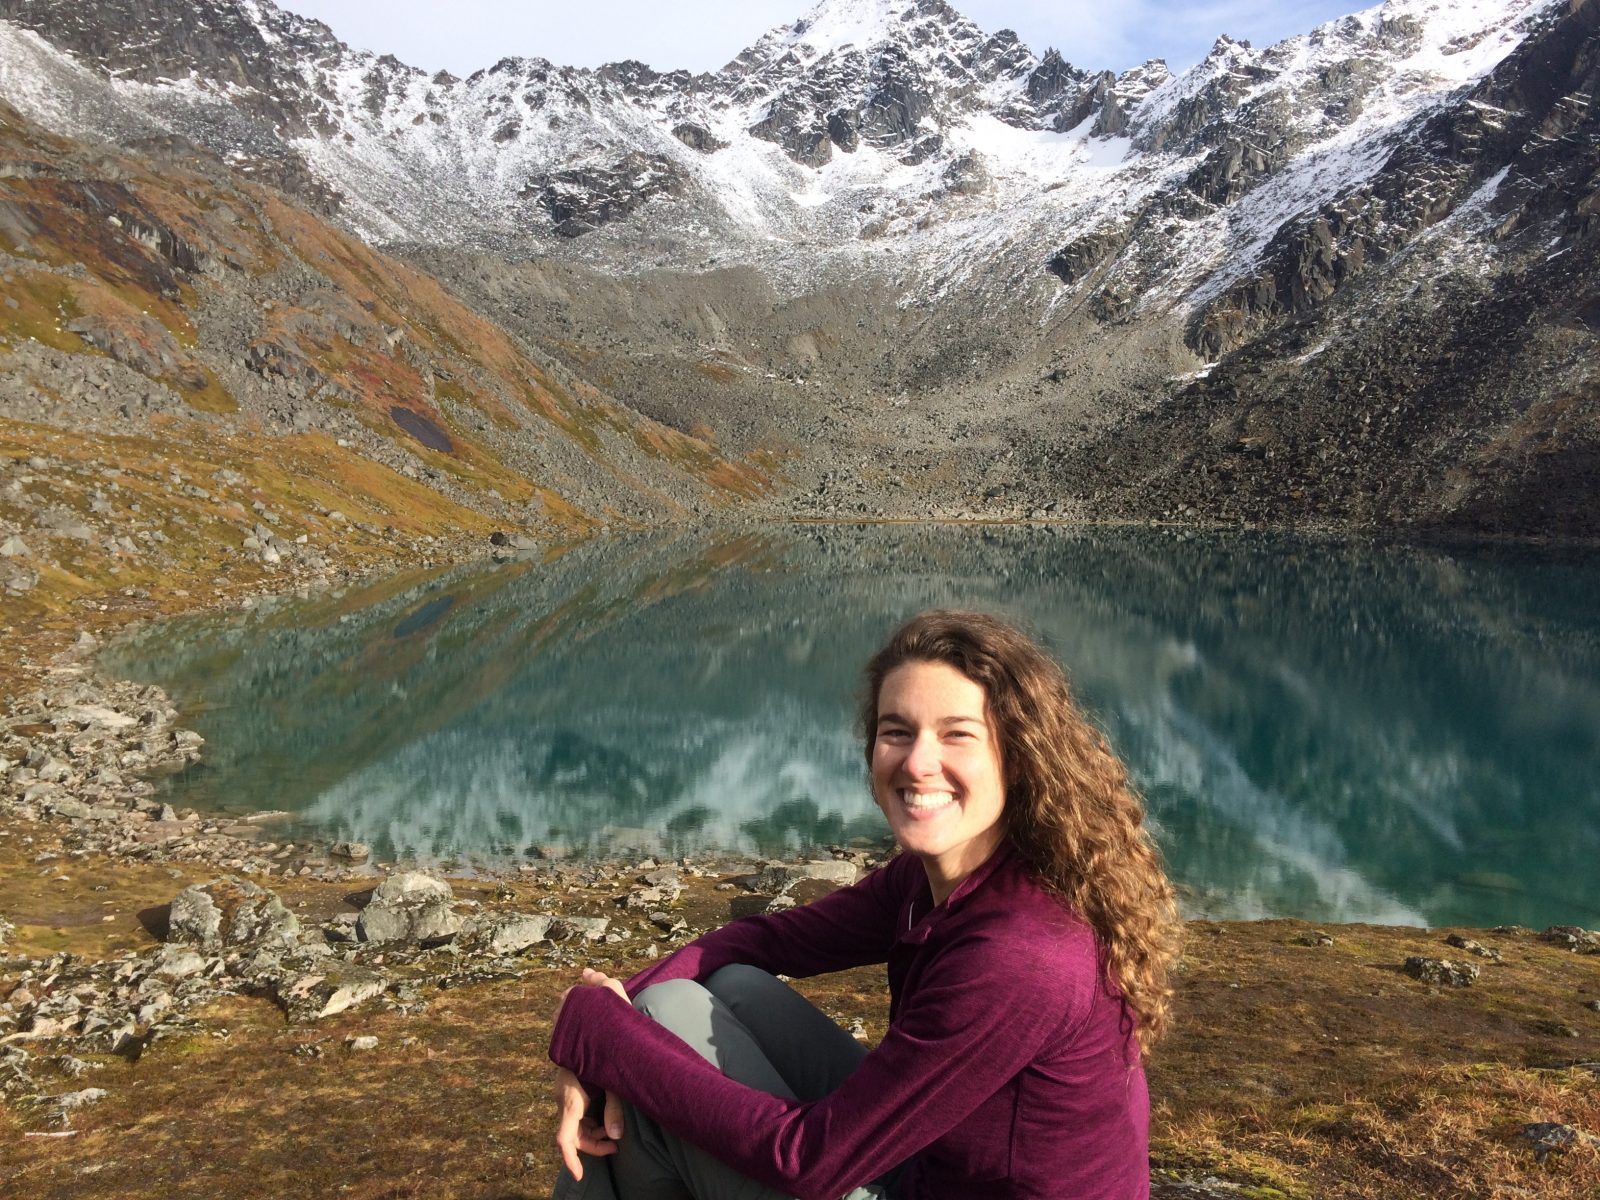 Lauren wants to protect Alaska lands and waters.